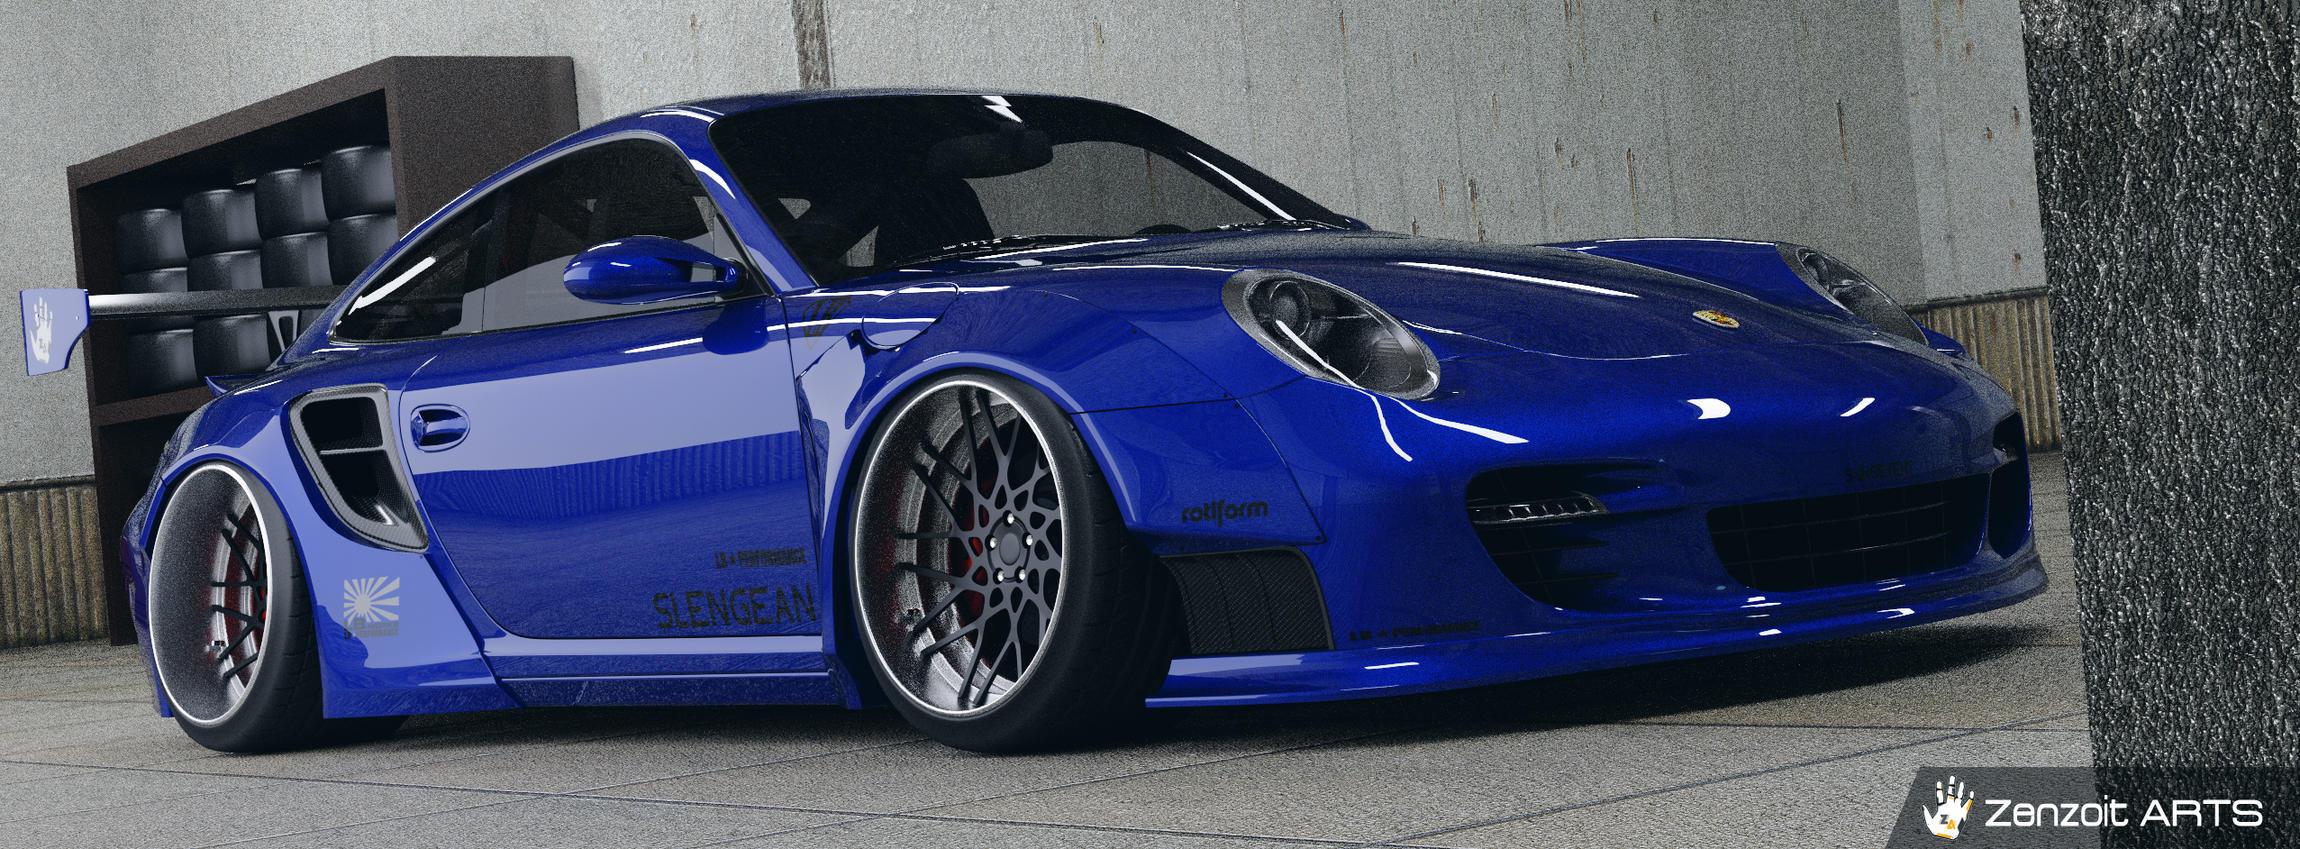 2007 Porche 911 Turbo Liberty Walk Kit - Finished Projects - Blender